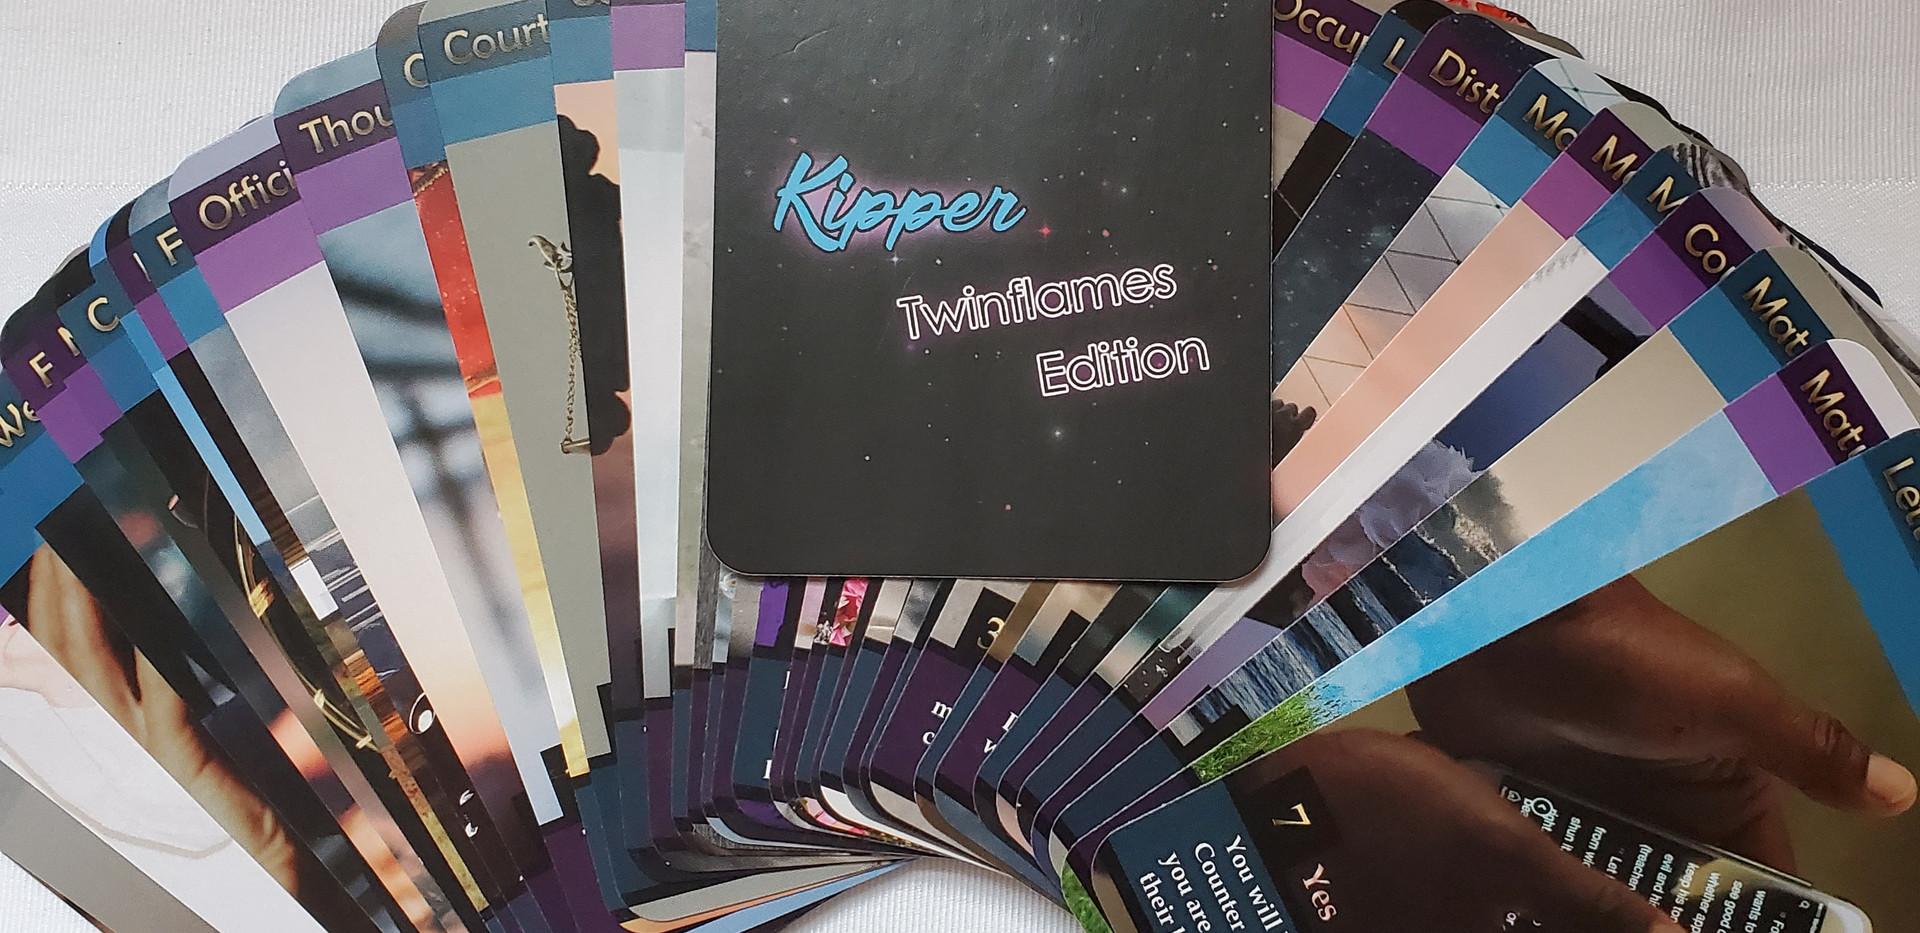 TF KIPPER 2.jpg